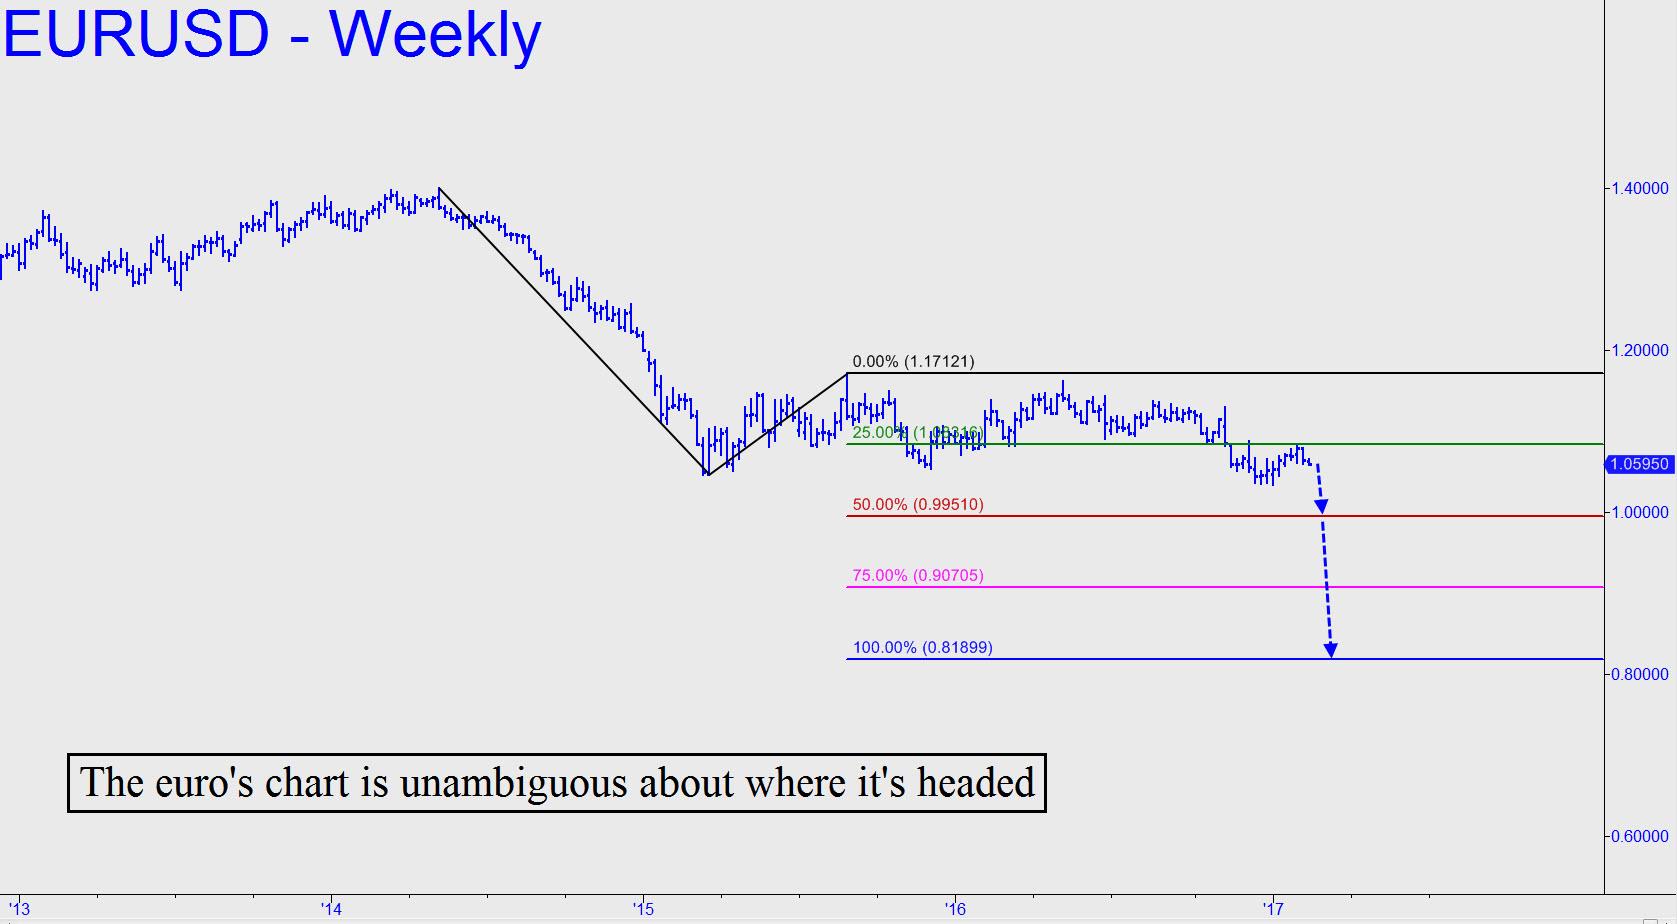 http://www.rickackerman.com/wp-content/uploads/2017/02/Euro-chart-is-unambiguous.jpg